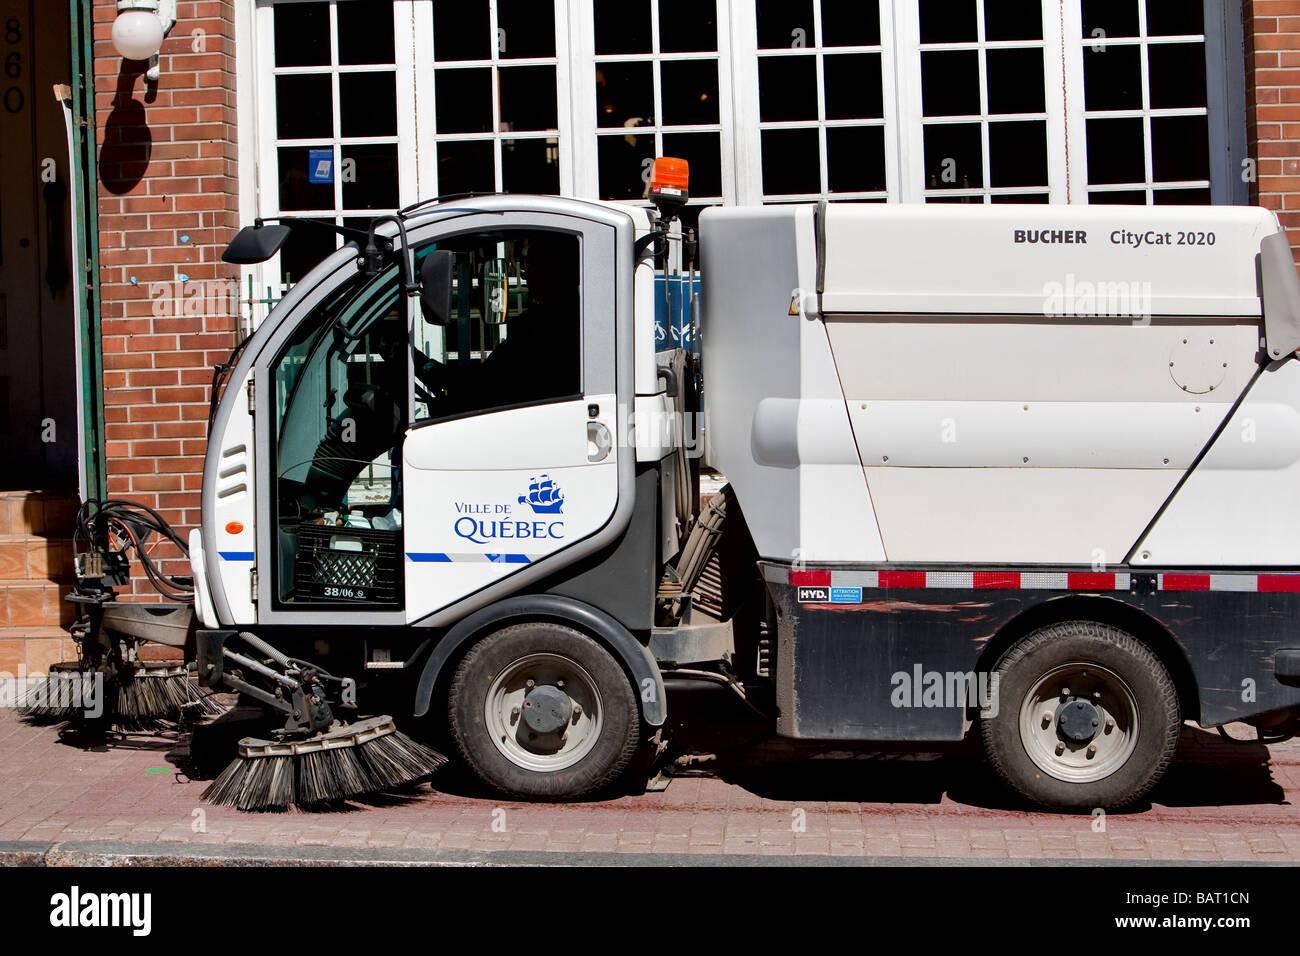 A Bucher Citycat 2020 street washer is seen on the rue St Jean street sidewalk in Quebec city - Stock Image